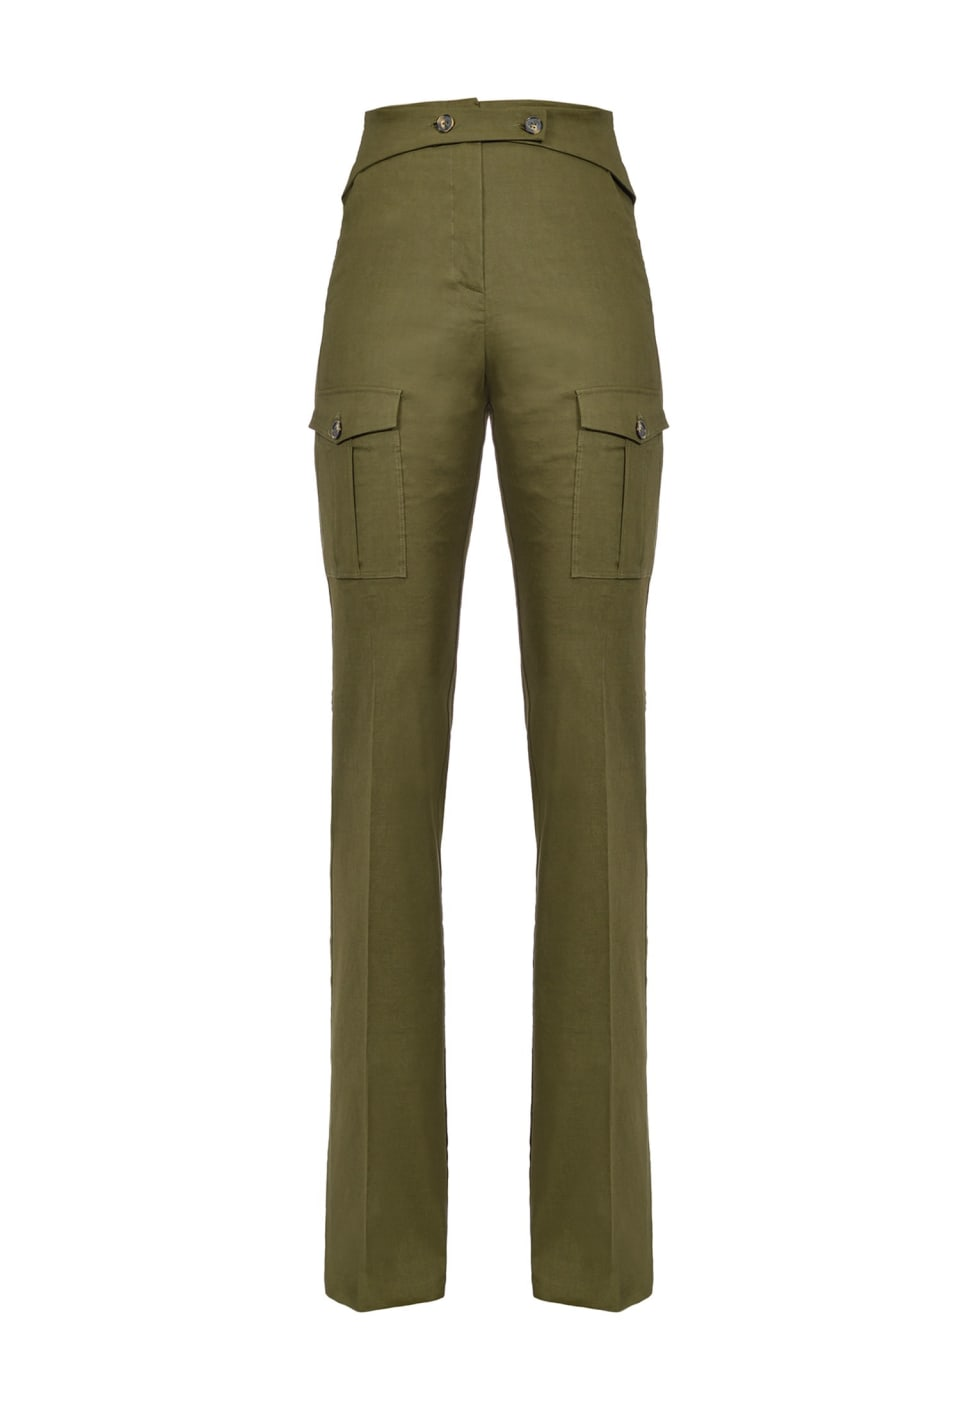 喇叭形工装长裤